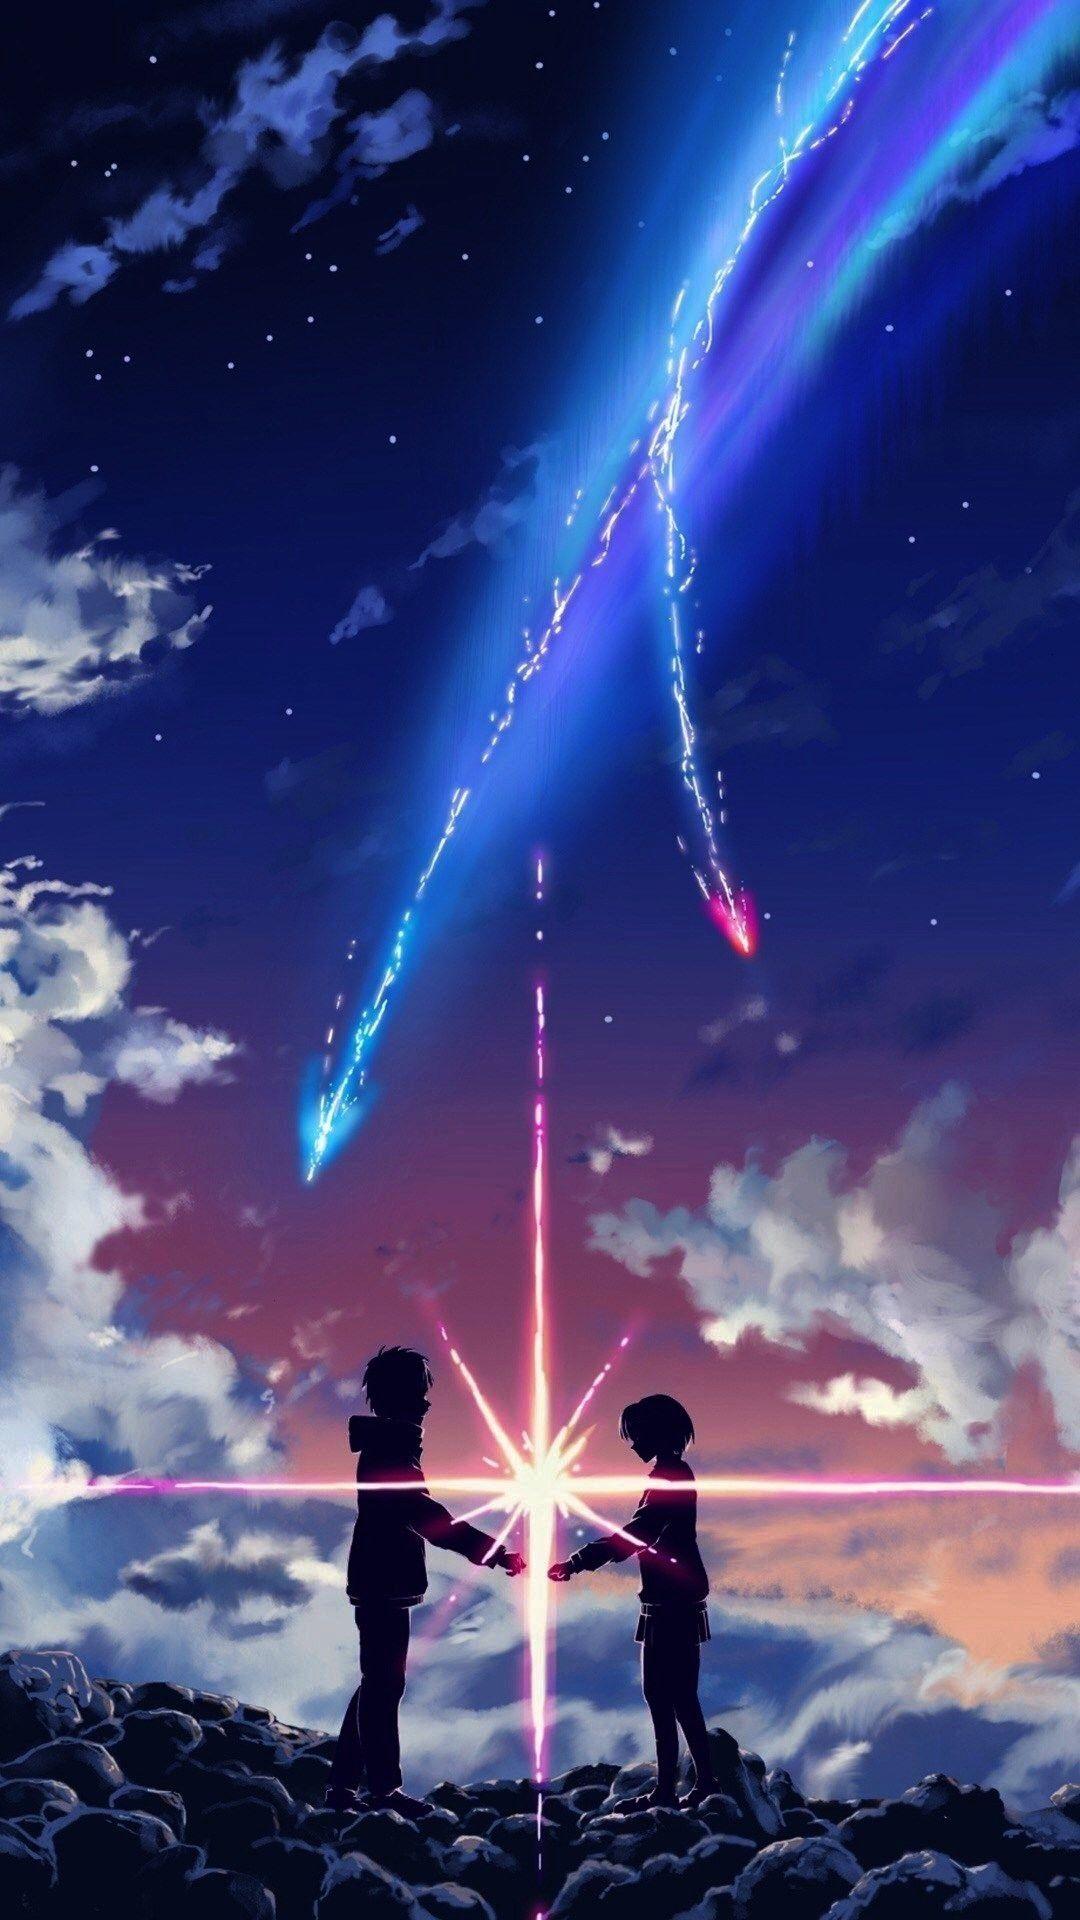 Anime Ipad Wallpaper Aesthetic